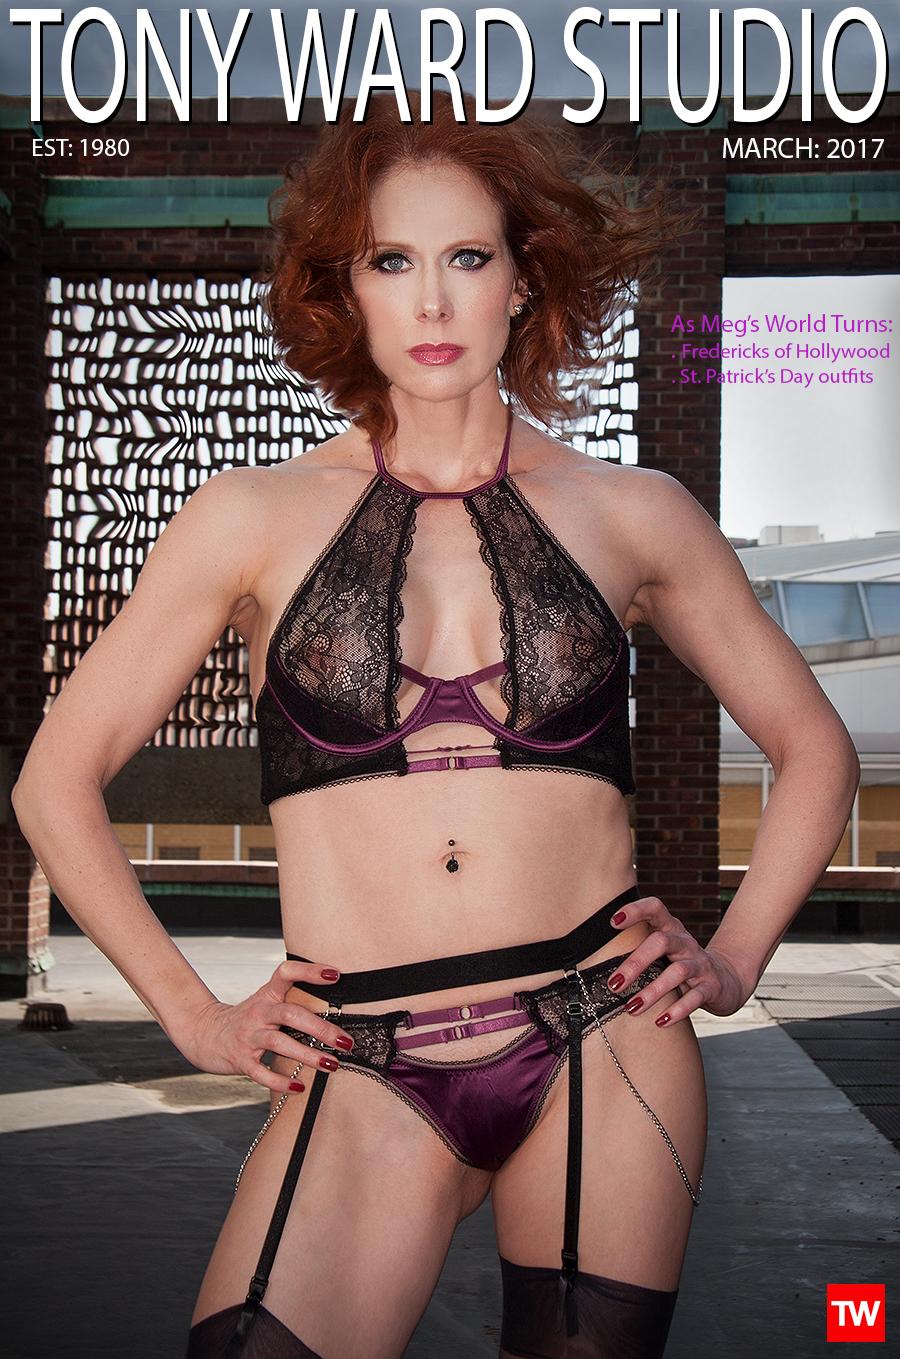 Tony_Ward_Studio_March_2017_Model_Megan_G_milf_fredricks_of_hollywood_lingerie_goddess